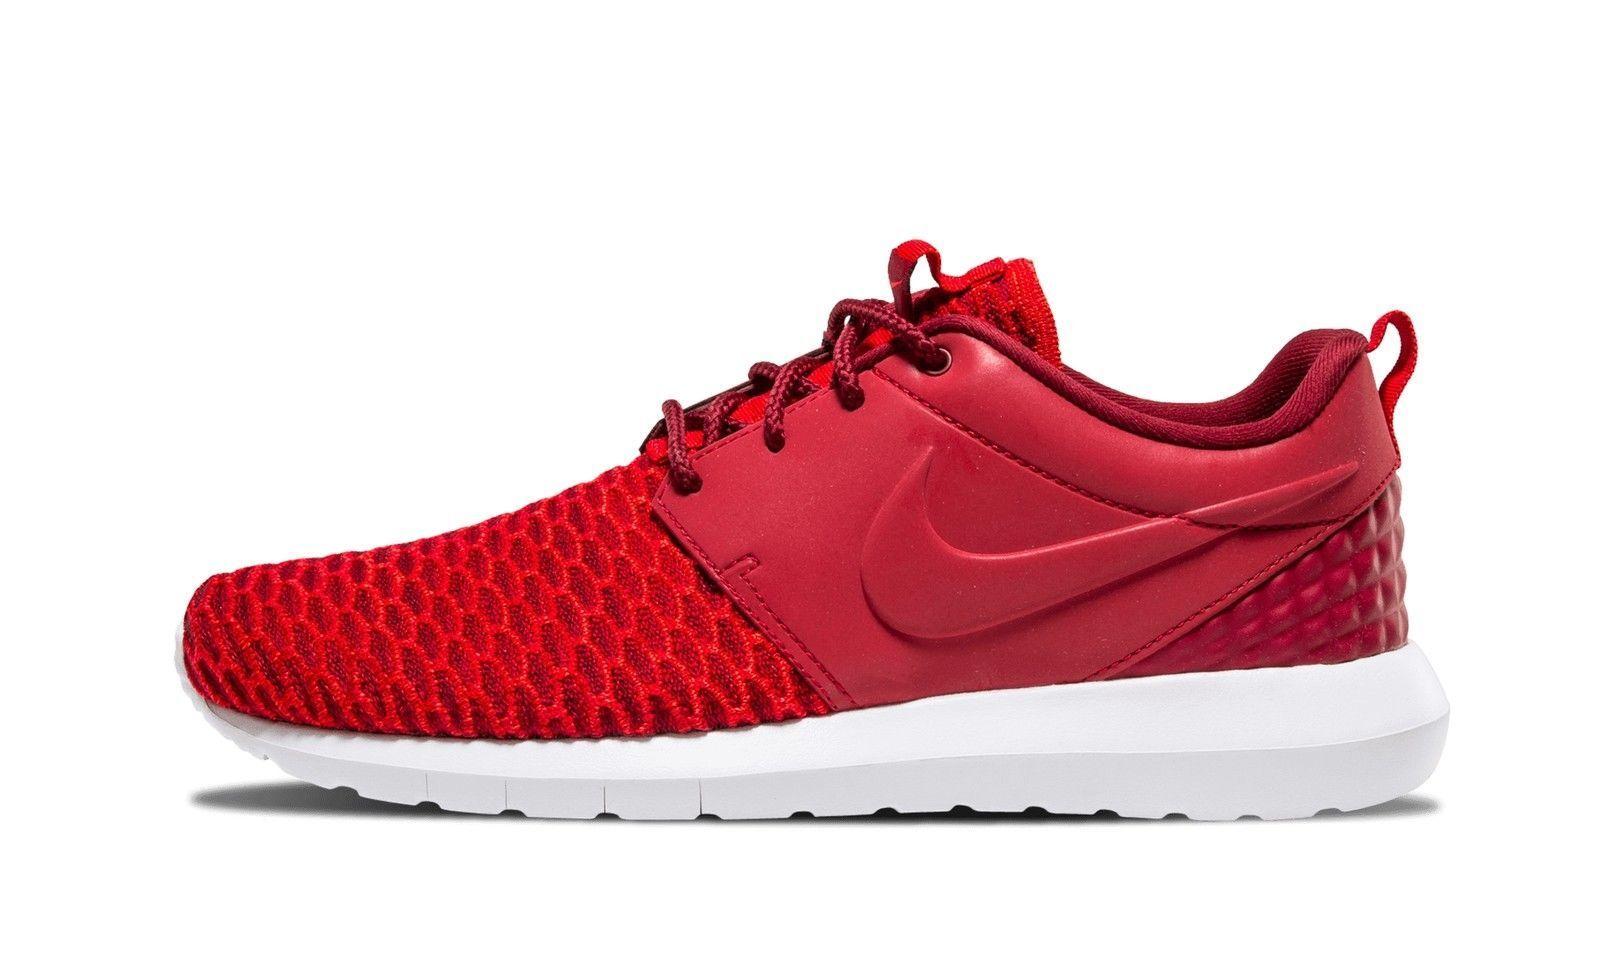 Men's Nike Roshe NM Flyknit Size 9 Shoes Gym/Team Red/Bright Crimson 746825 NEW